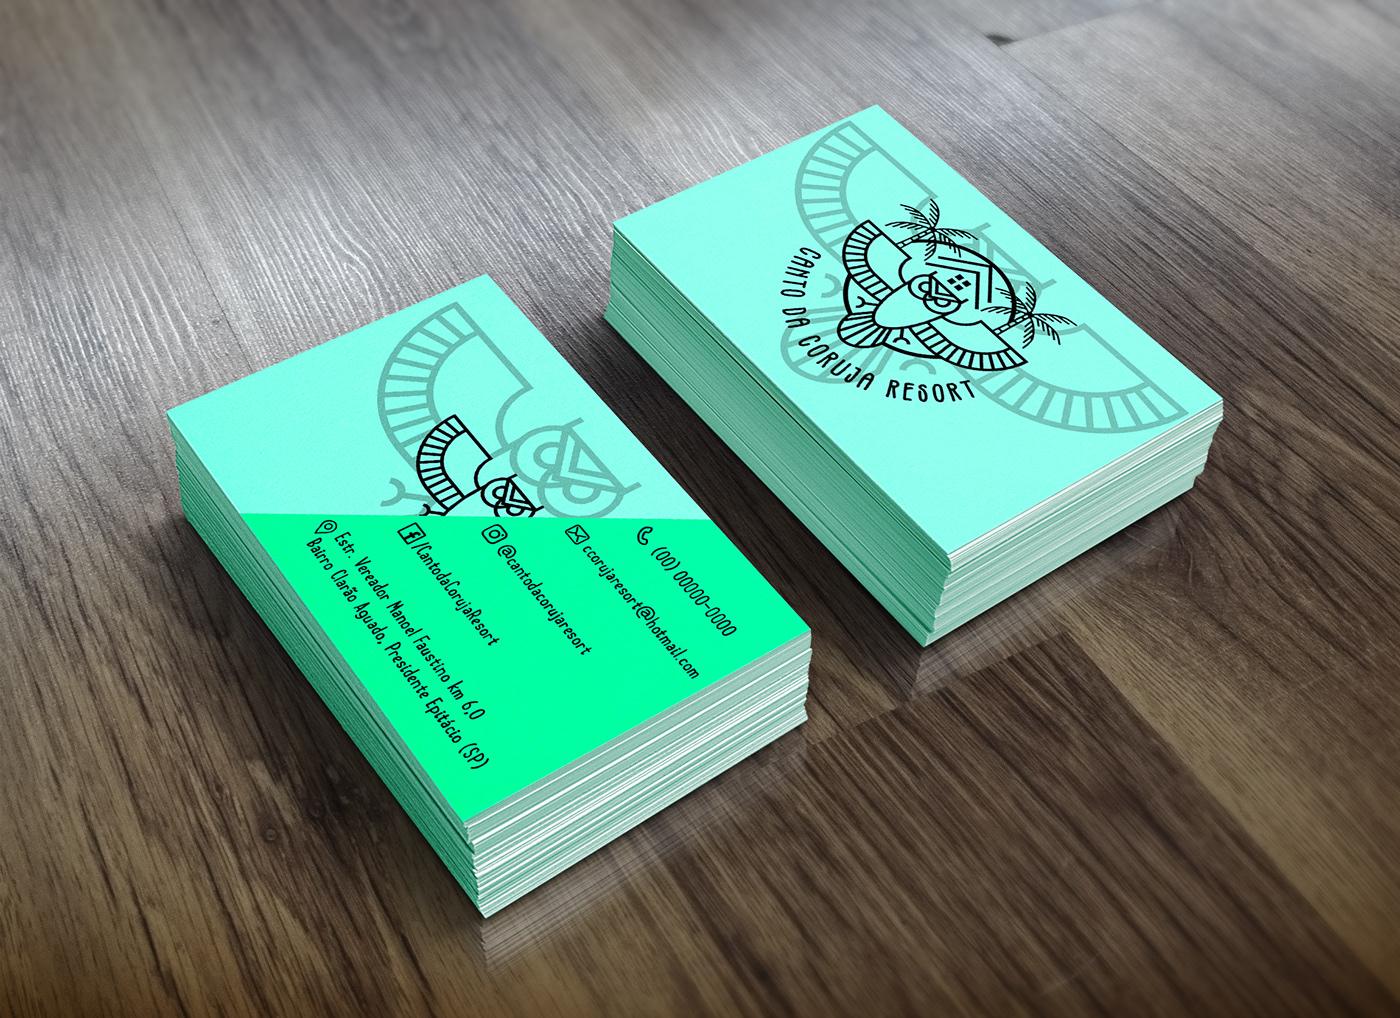 Image may contain: book, handwriting and card